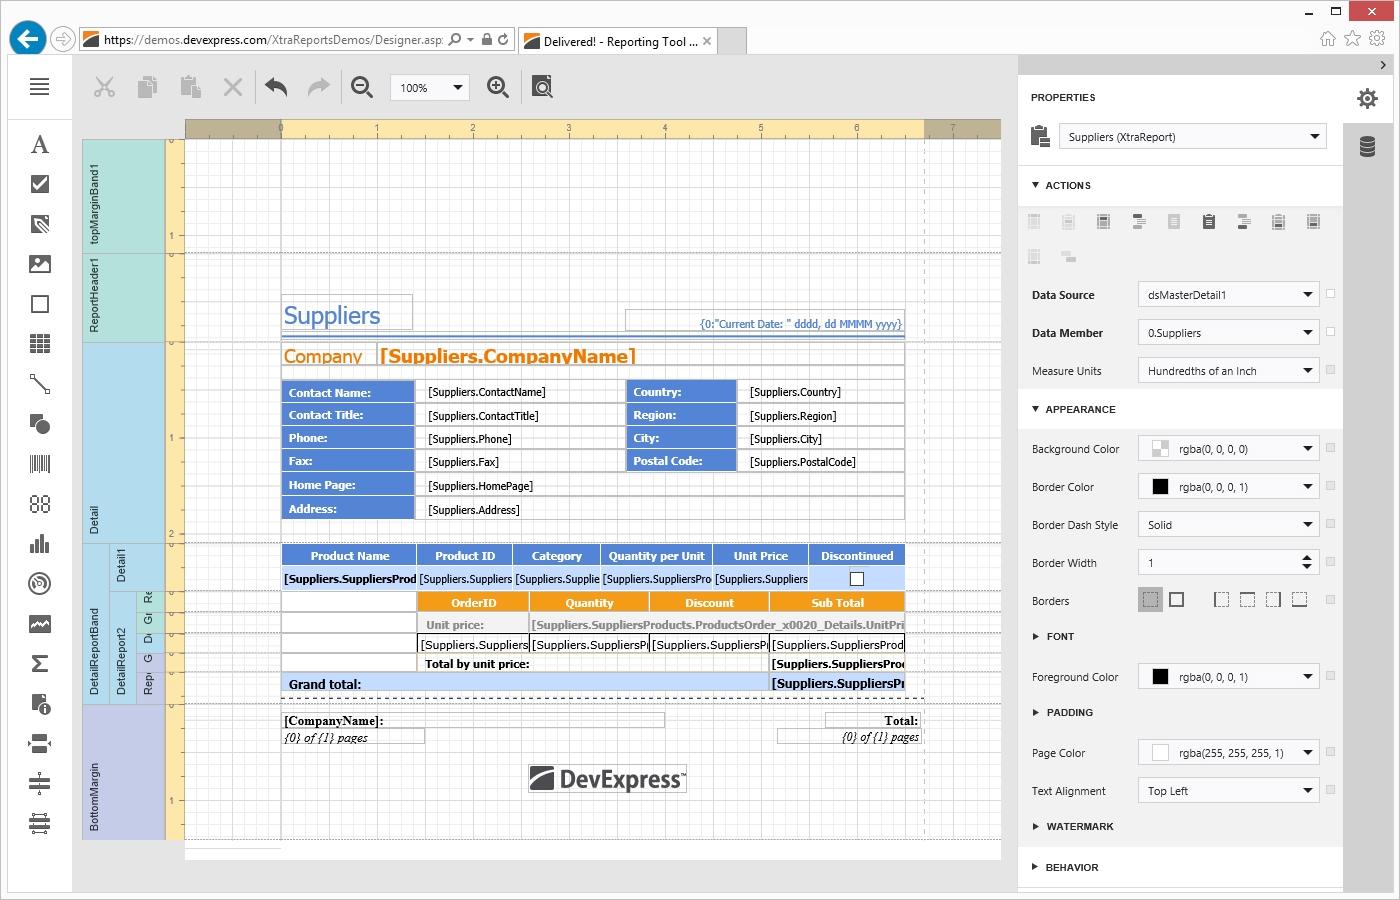 DevExpress Reporting界面预览:aspnet-enduser-report-designer